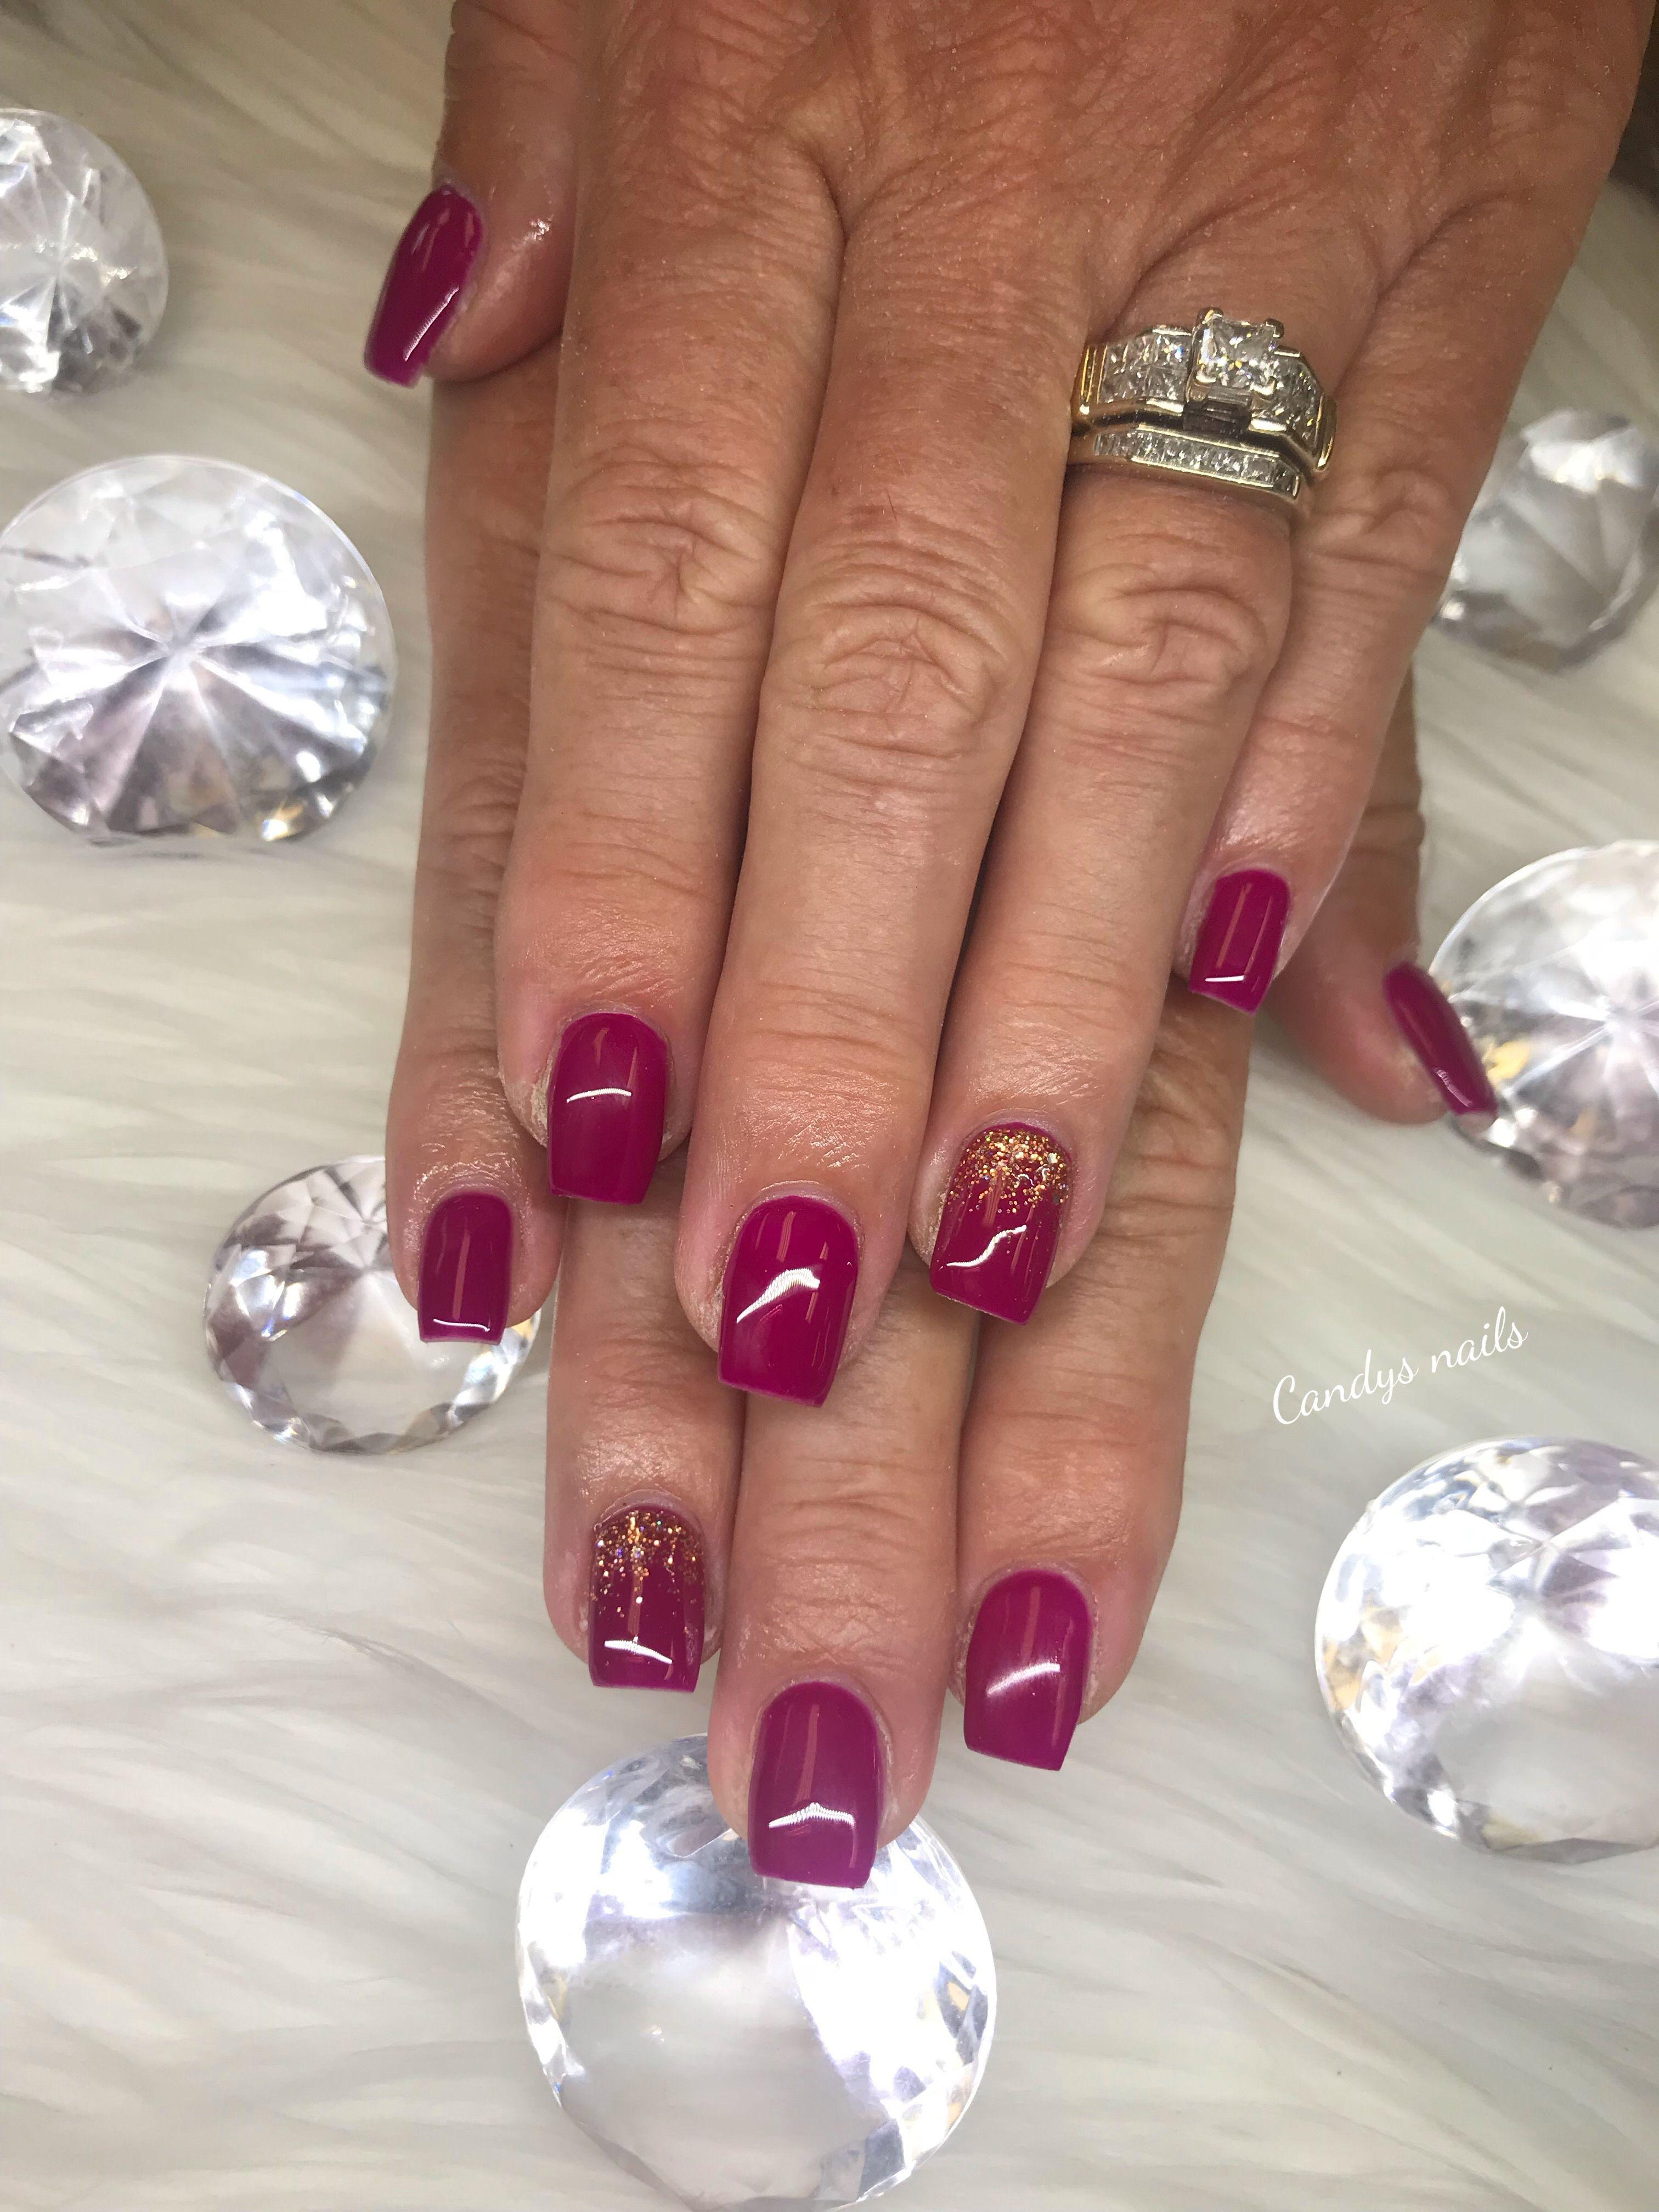 Red Gel Overlay Acrylic Nails Nails Gel Overlay Acrylic Nails